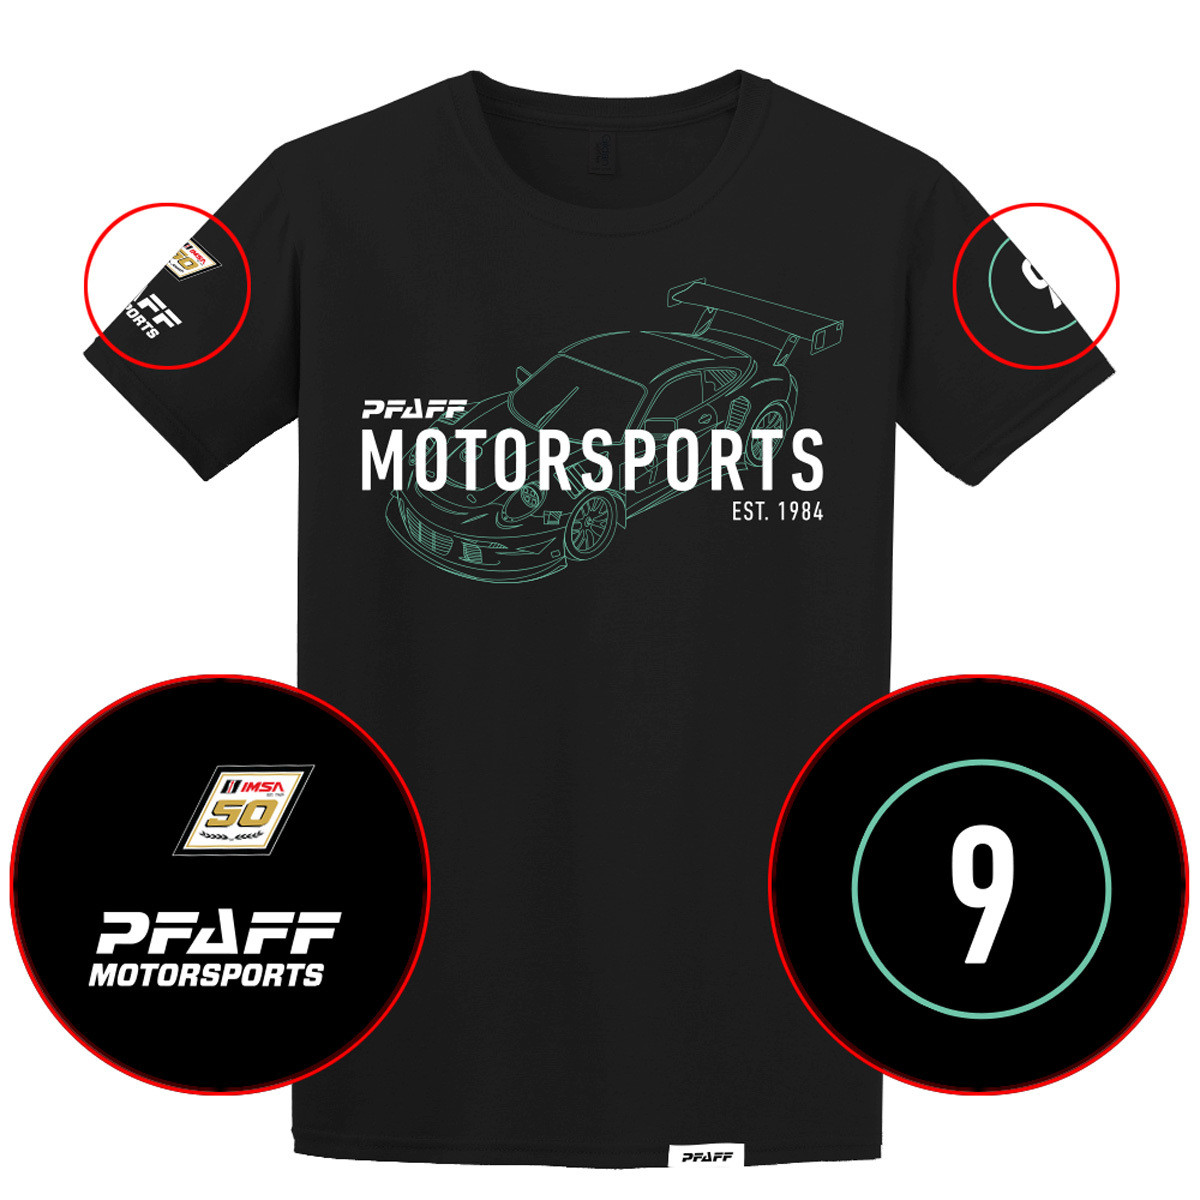 Pfaff Racing/IMSA 50th Anniversary Tee - Black